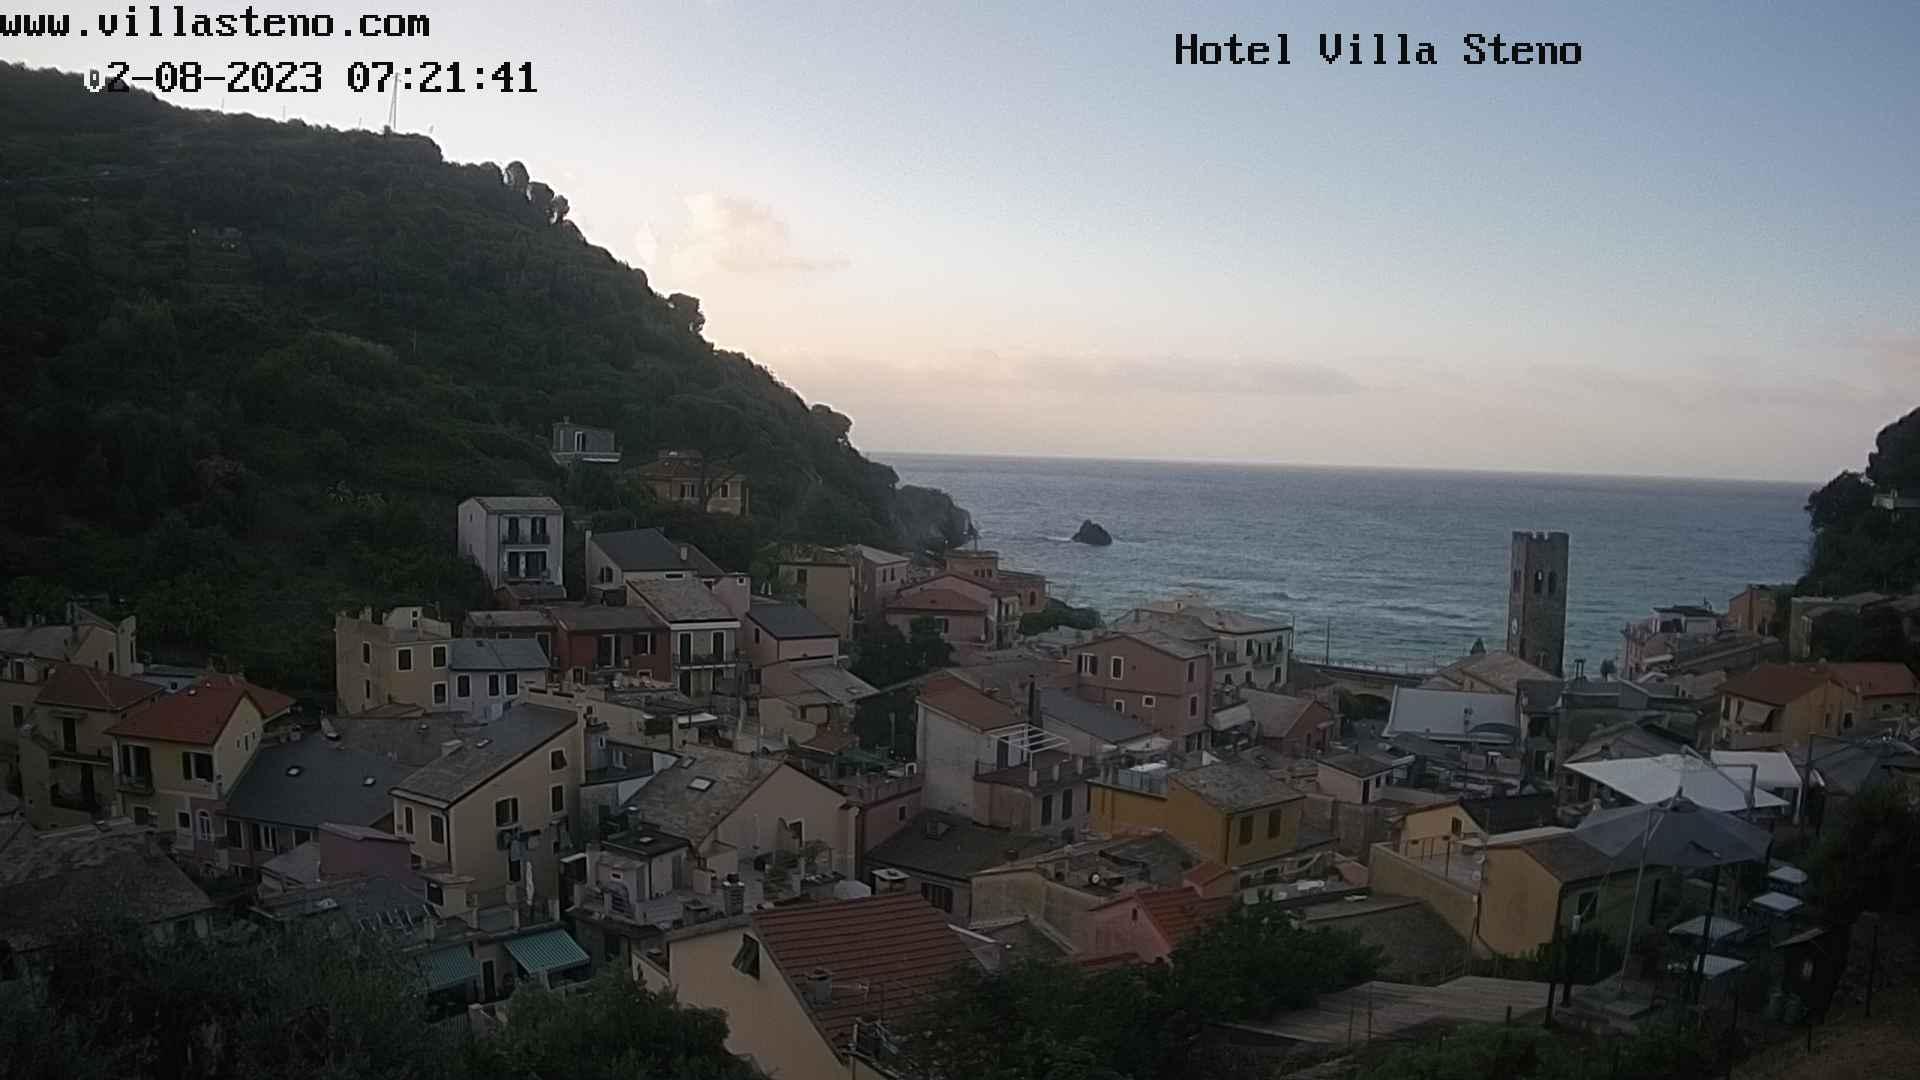 Webcam live Hôtel Villa Steno - Monterosso al Mare - Cinque Terre - Italie